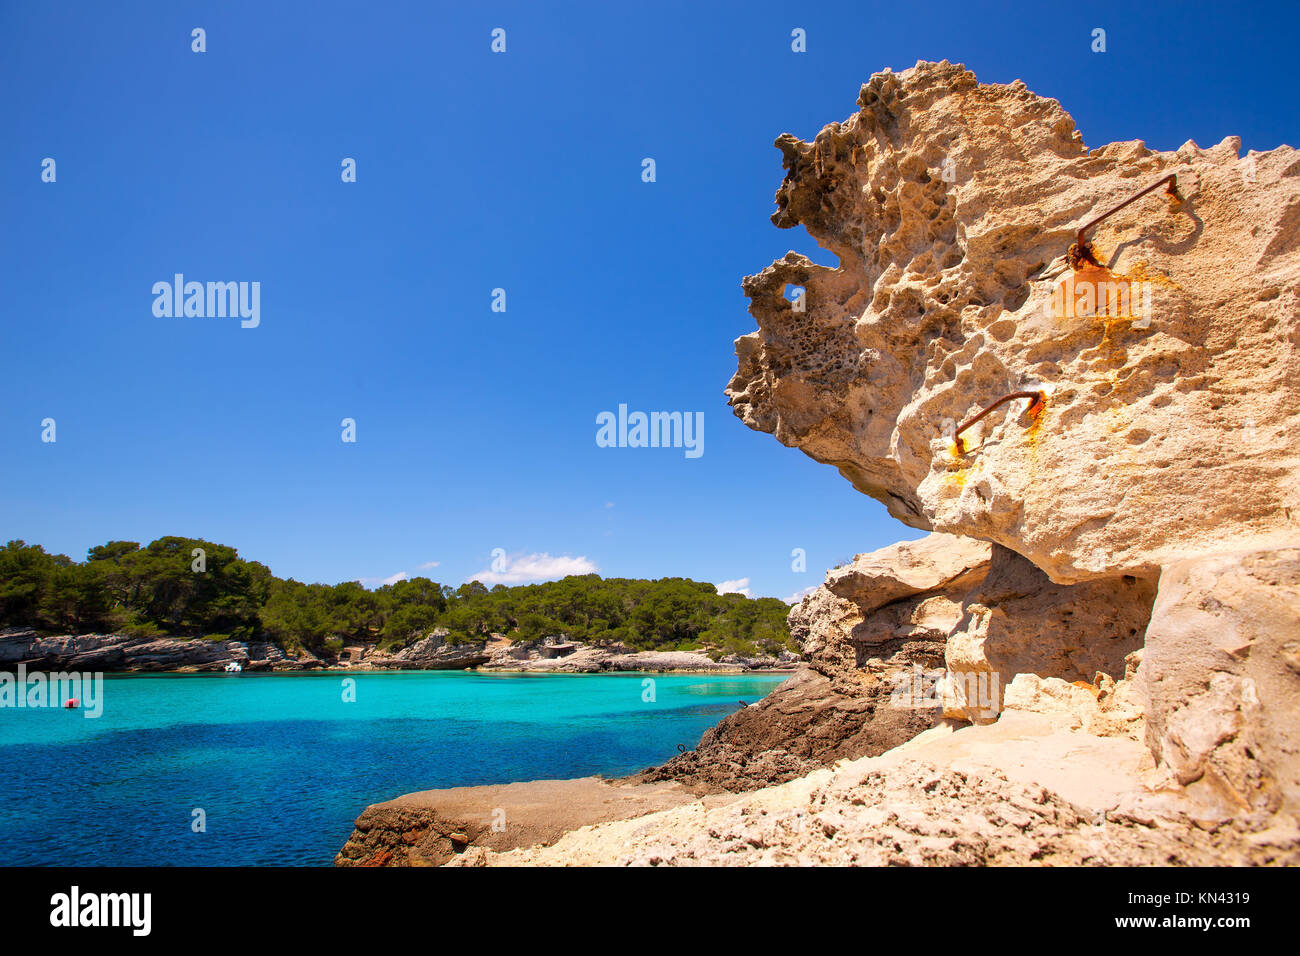 Menorca Cala en Turqueta Ciutadella Méditerranée turquoise à îles Baléares. Photo Stock